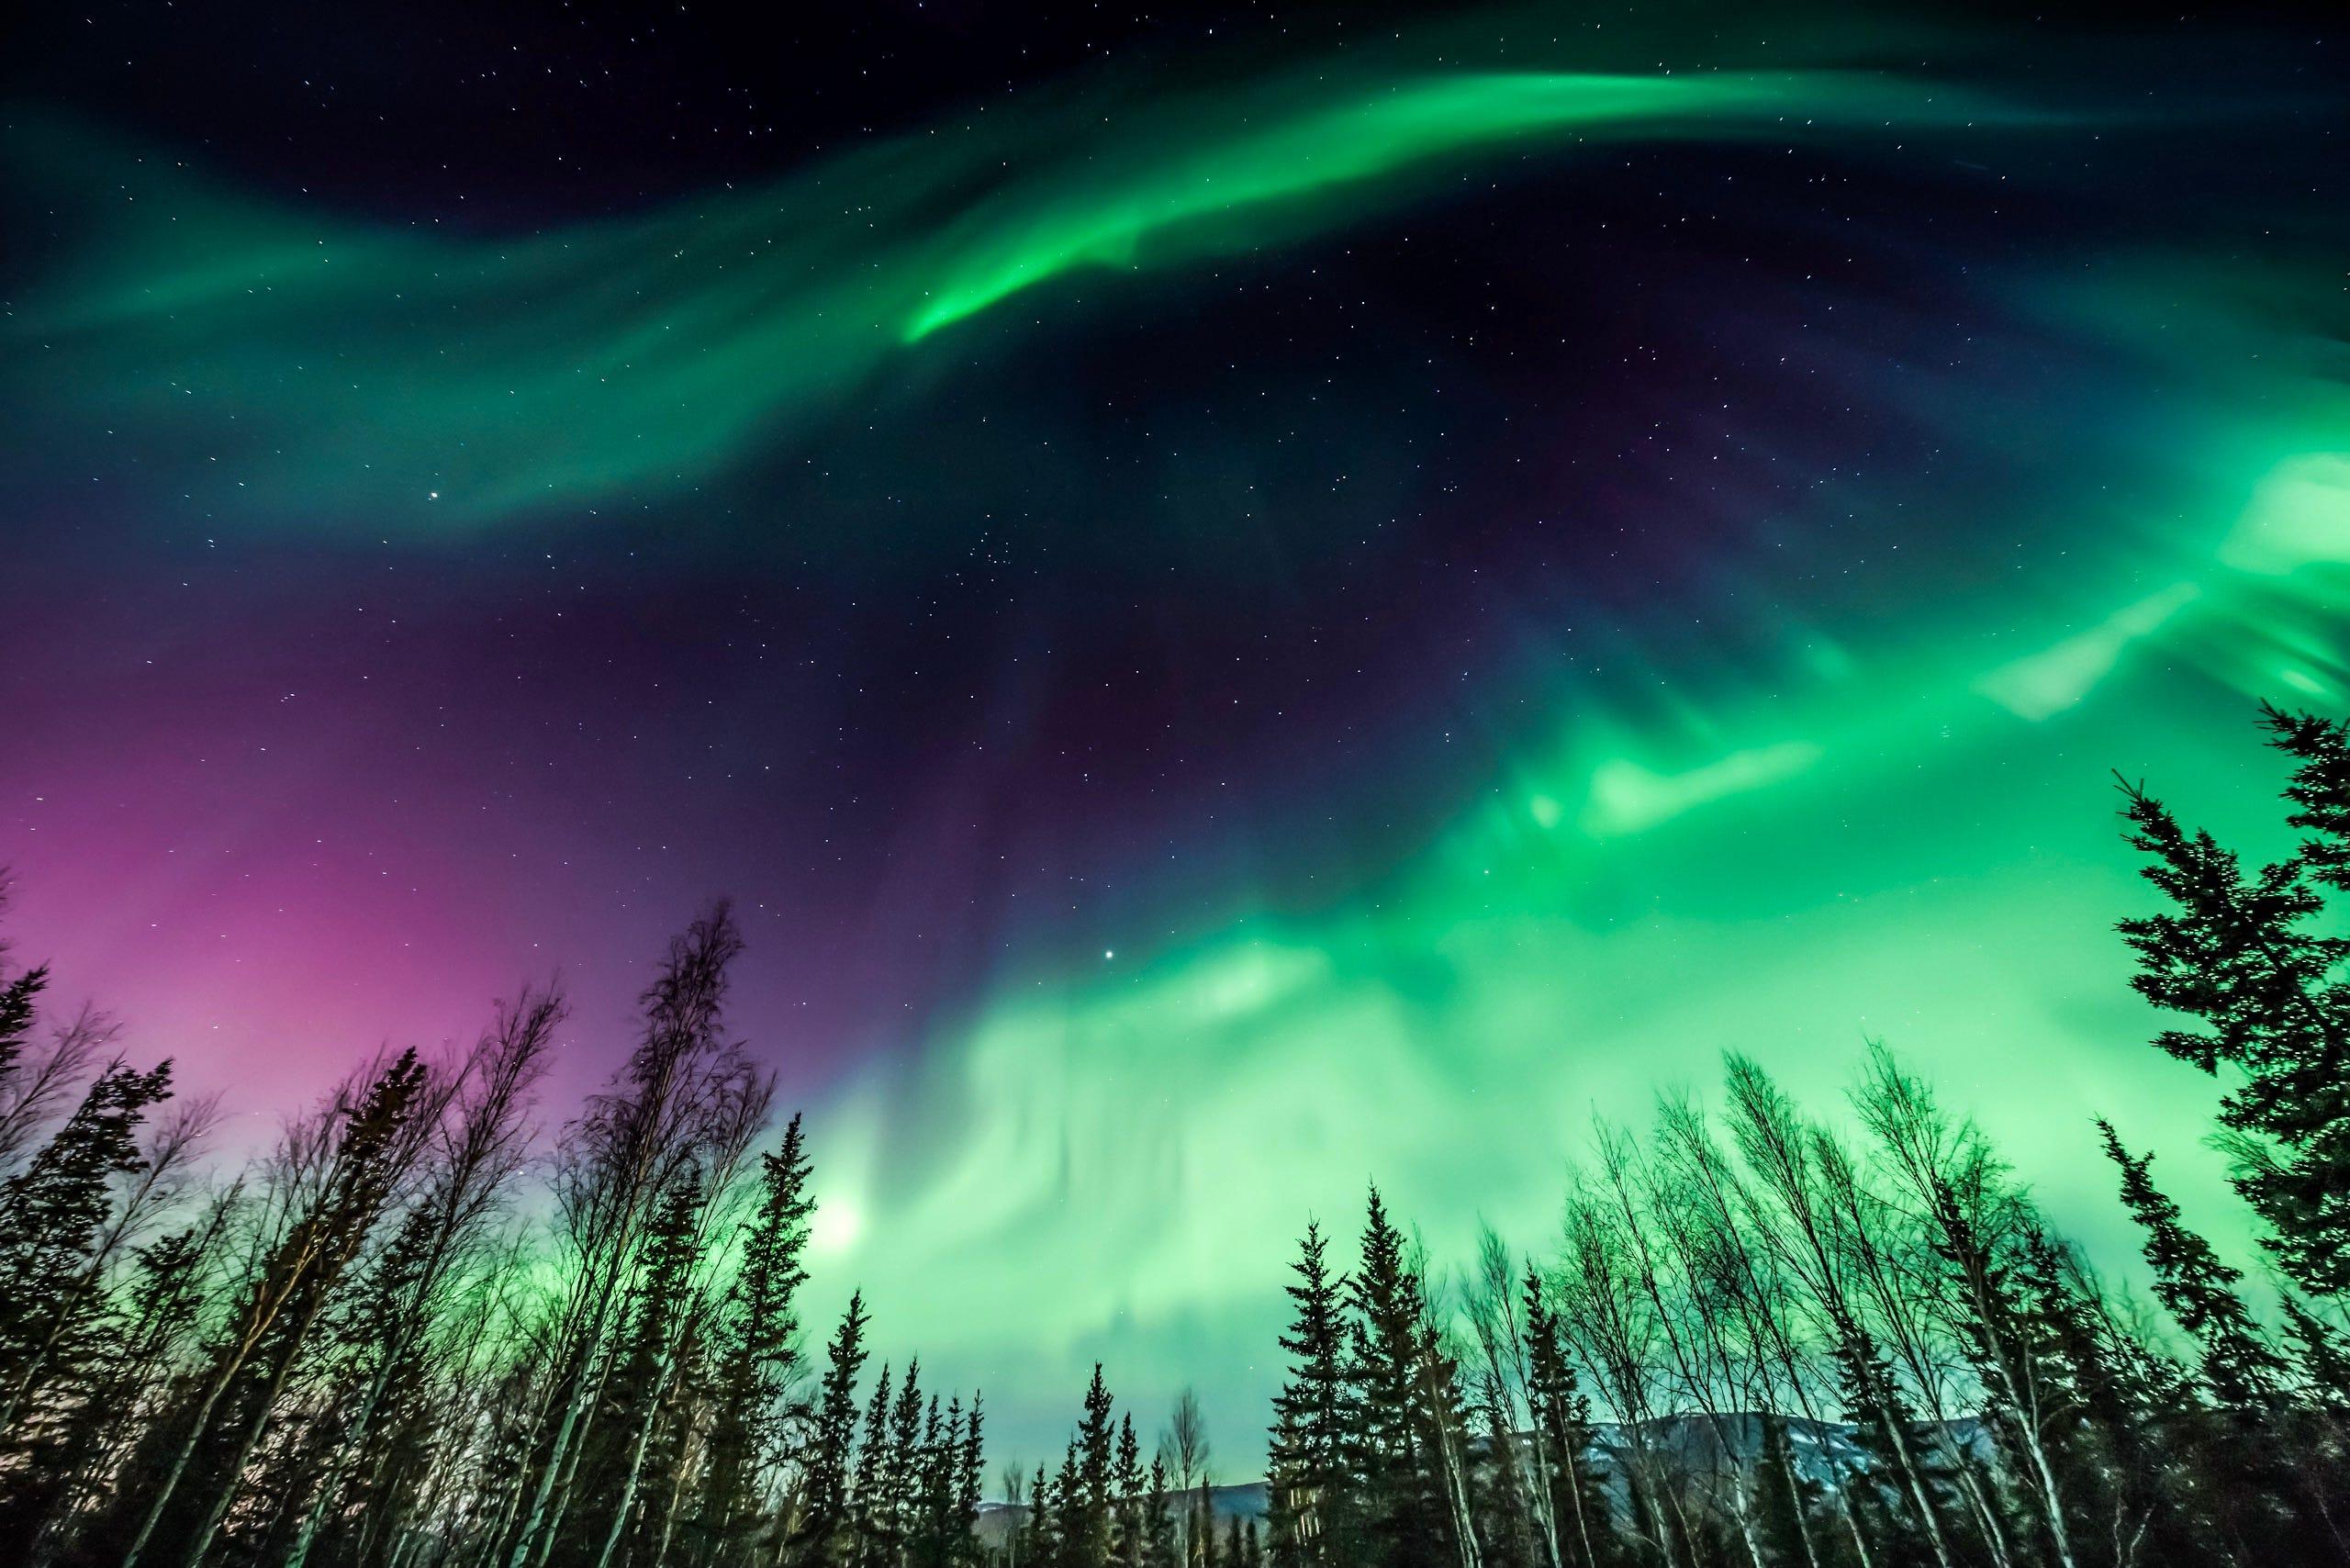 Face check: Photo captures a fluorescent light, not aurora borealis